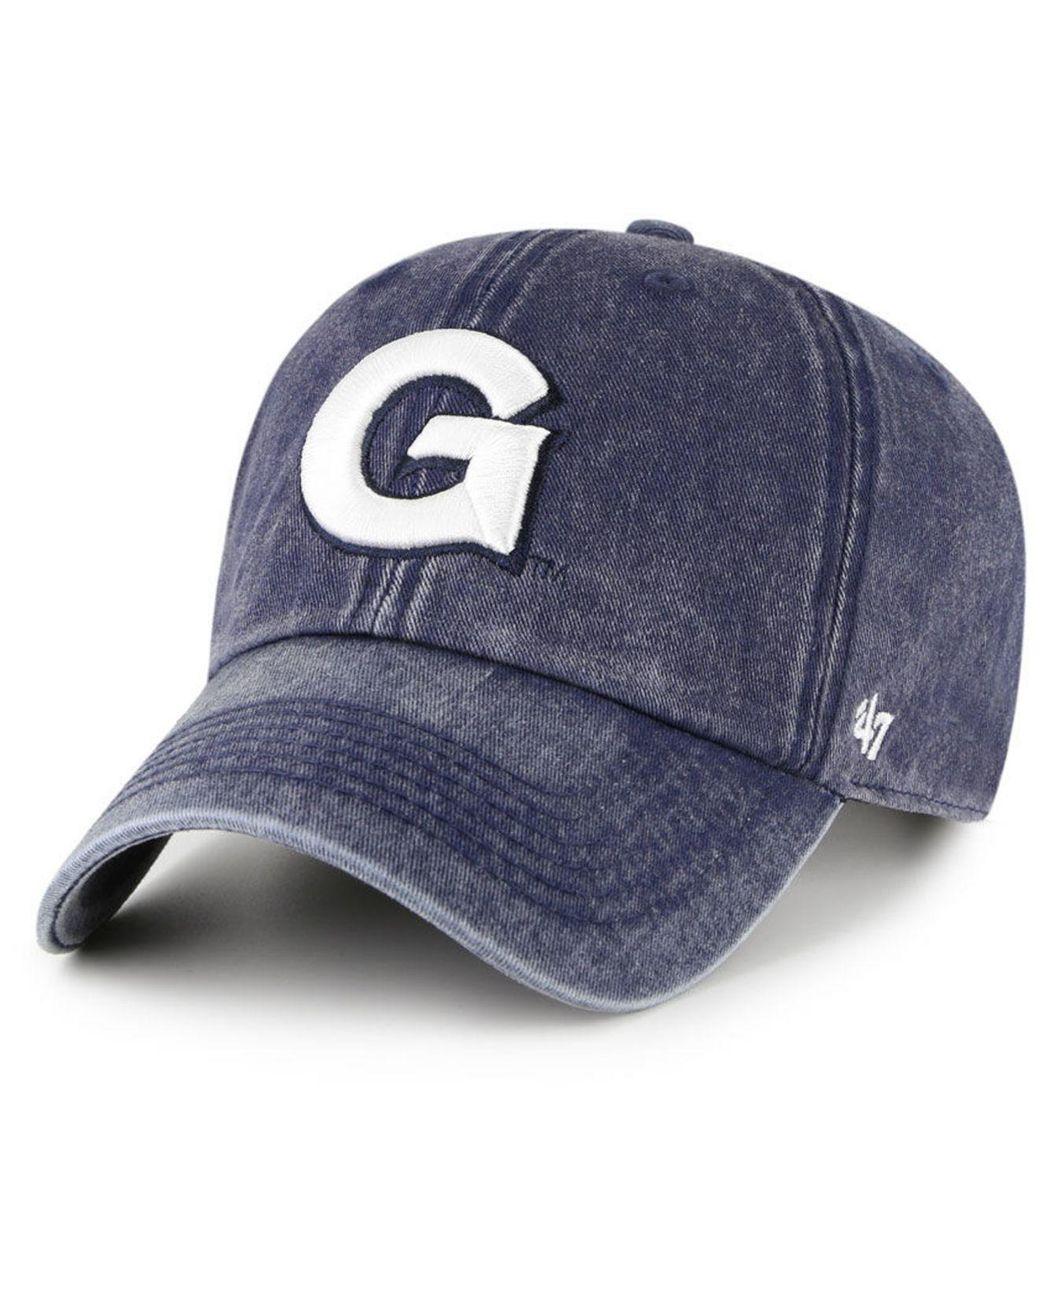 best supplier promo codes separation shoes 47 Brand Georgetown Hoyas Denim Drift Cap in Blue for Men - Lyst